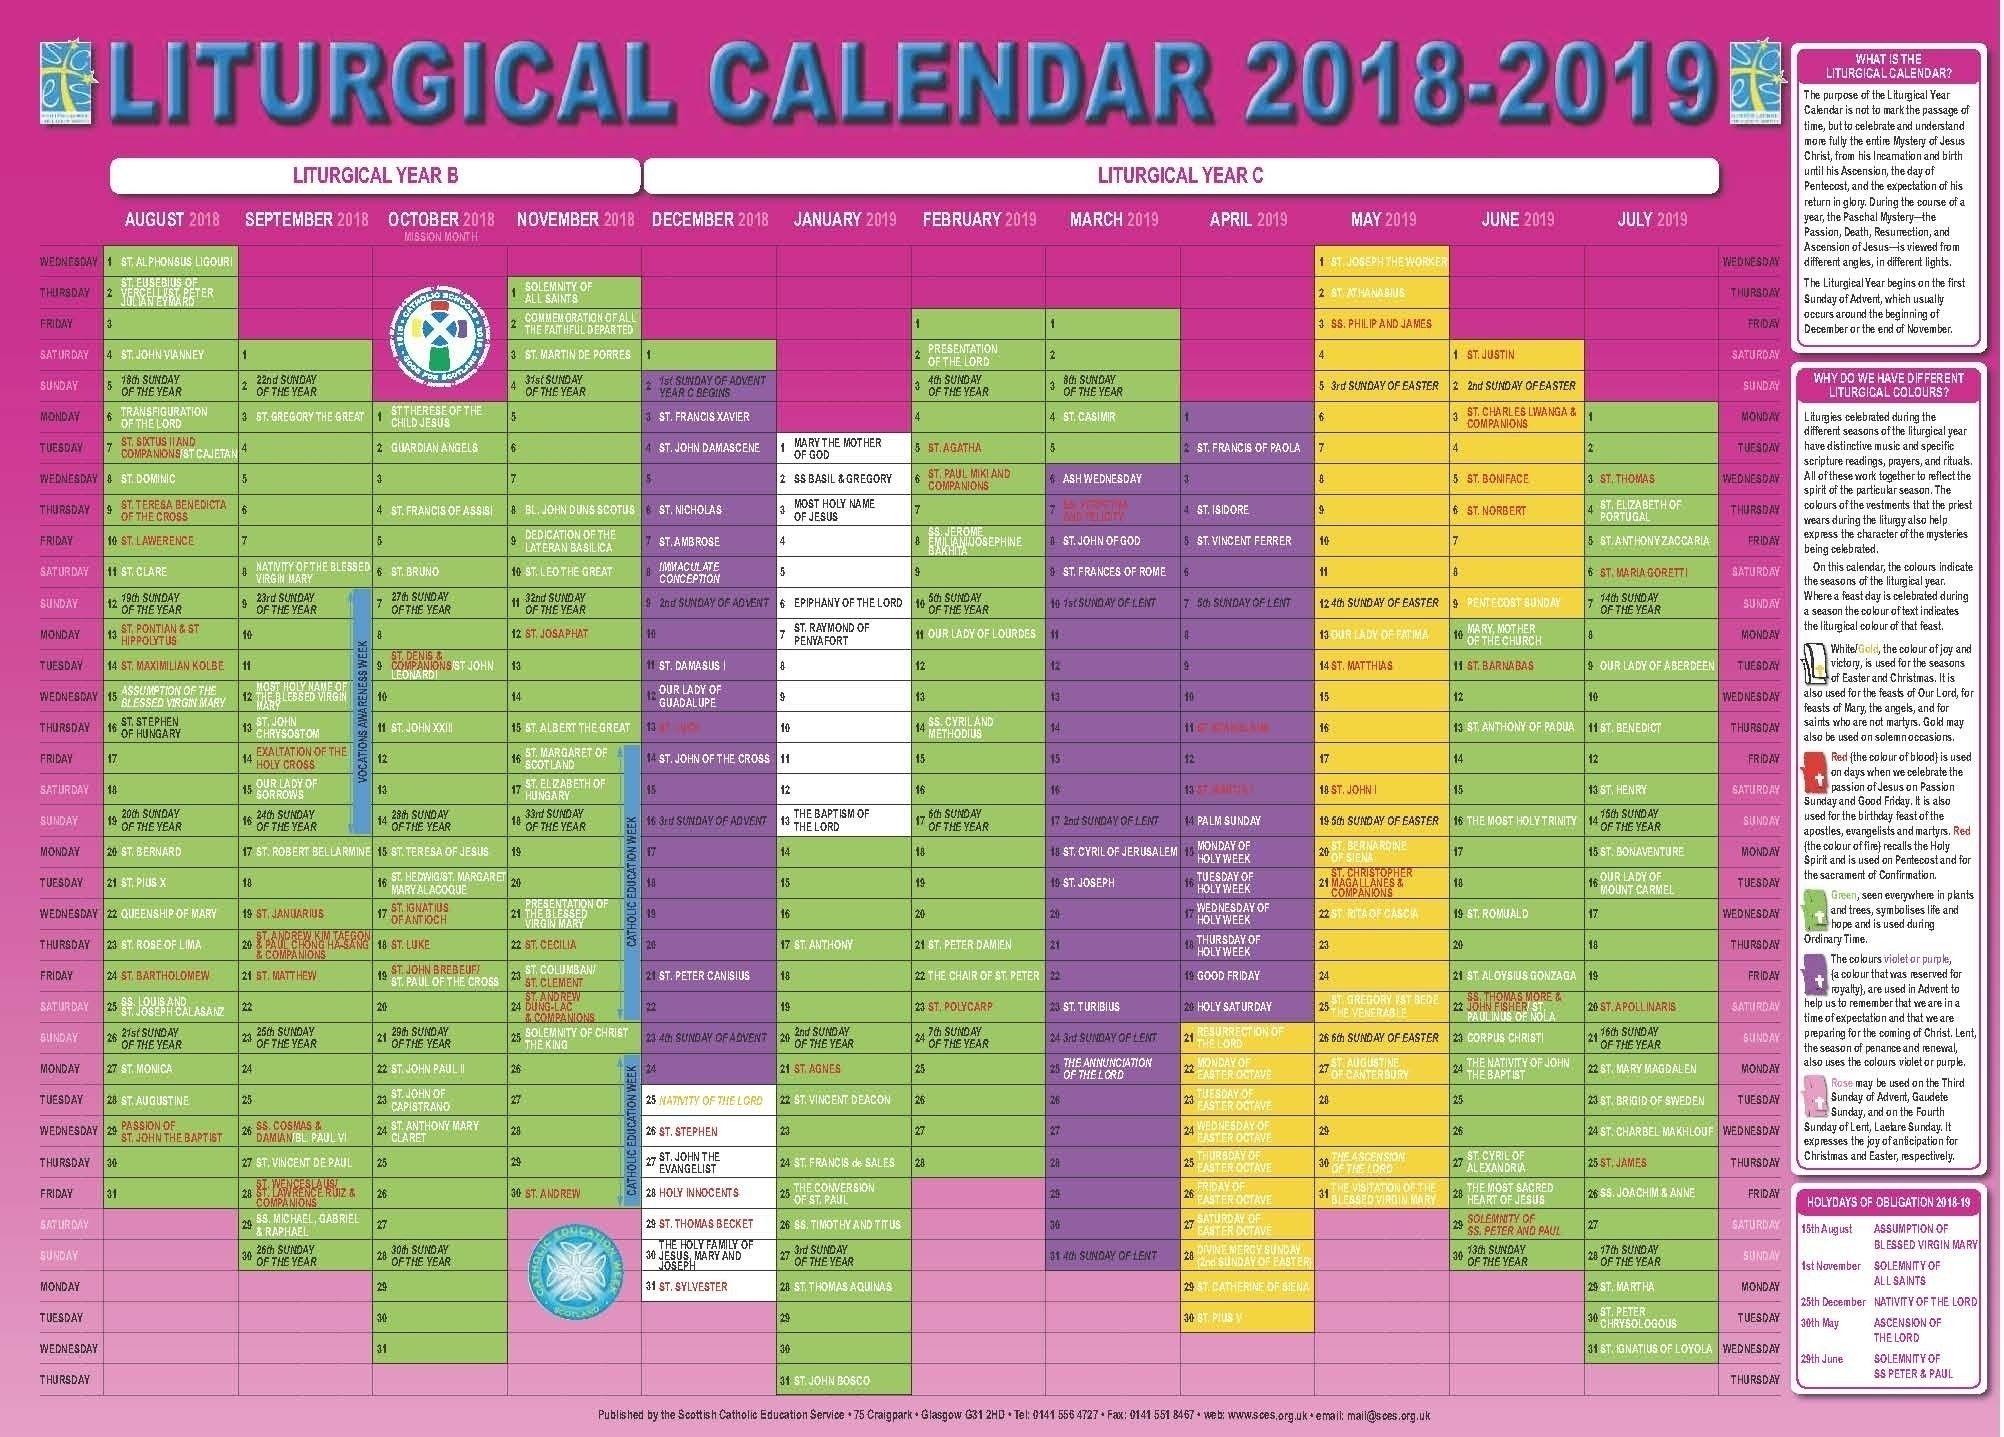 Free Printable Liturgical Calendar In 2020 | Catholic within Printable Year A Liturgical Calendar 2020